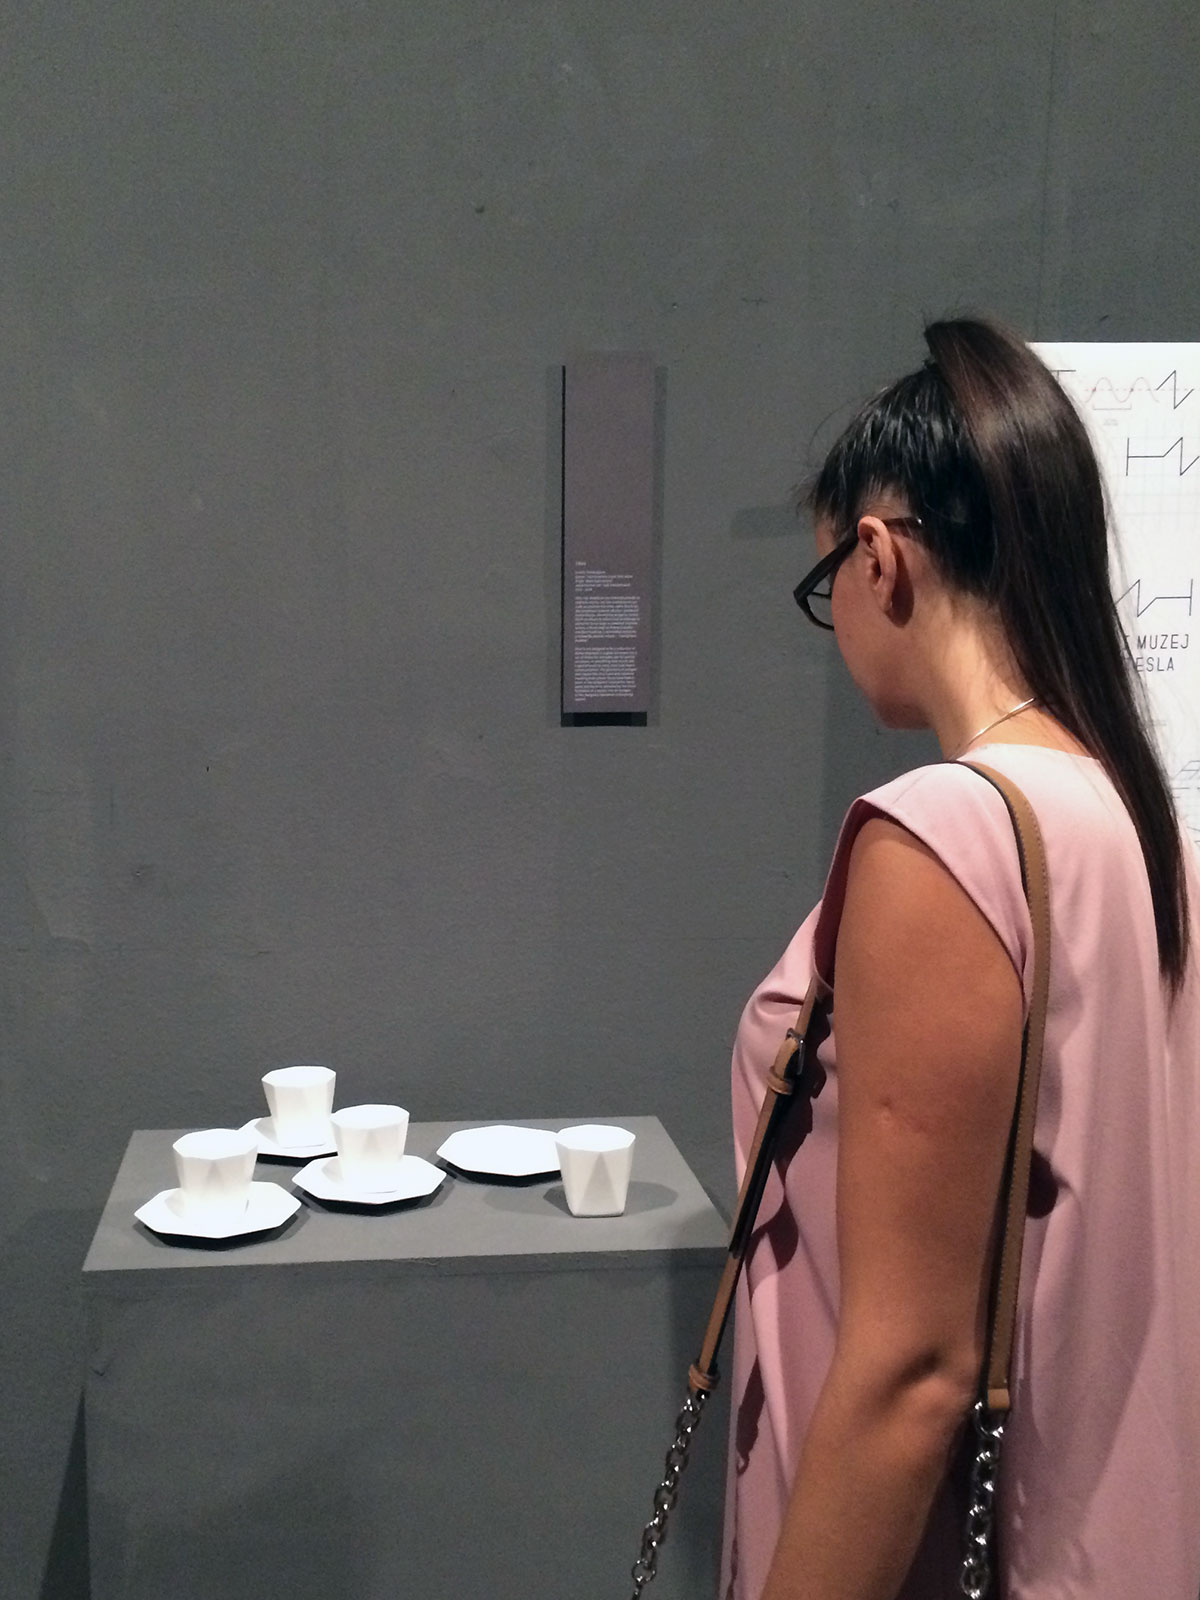 masavukmanovic.com - croatian design biennale 1516 - okto tableware